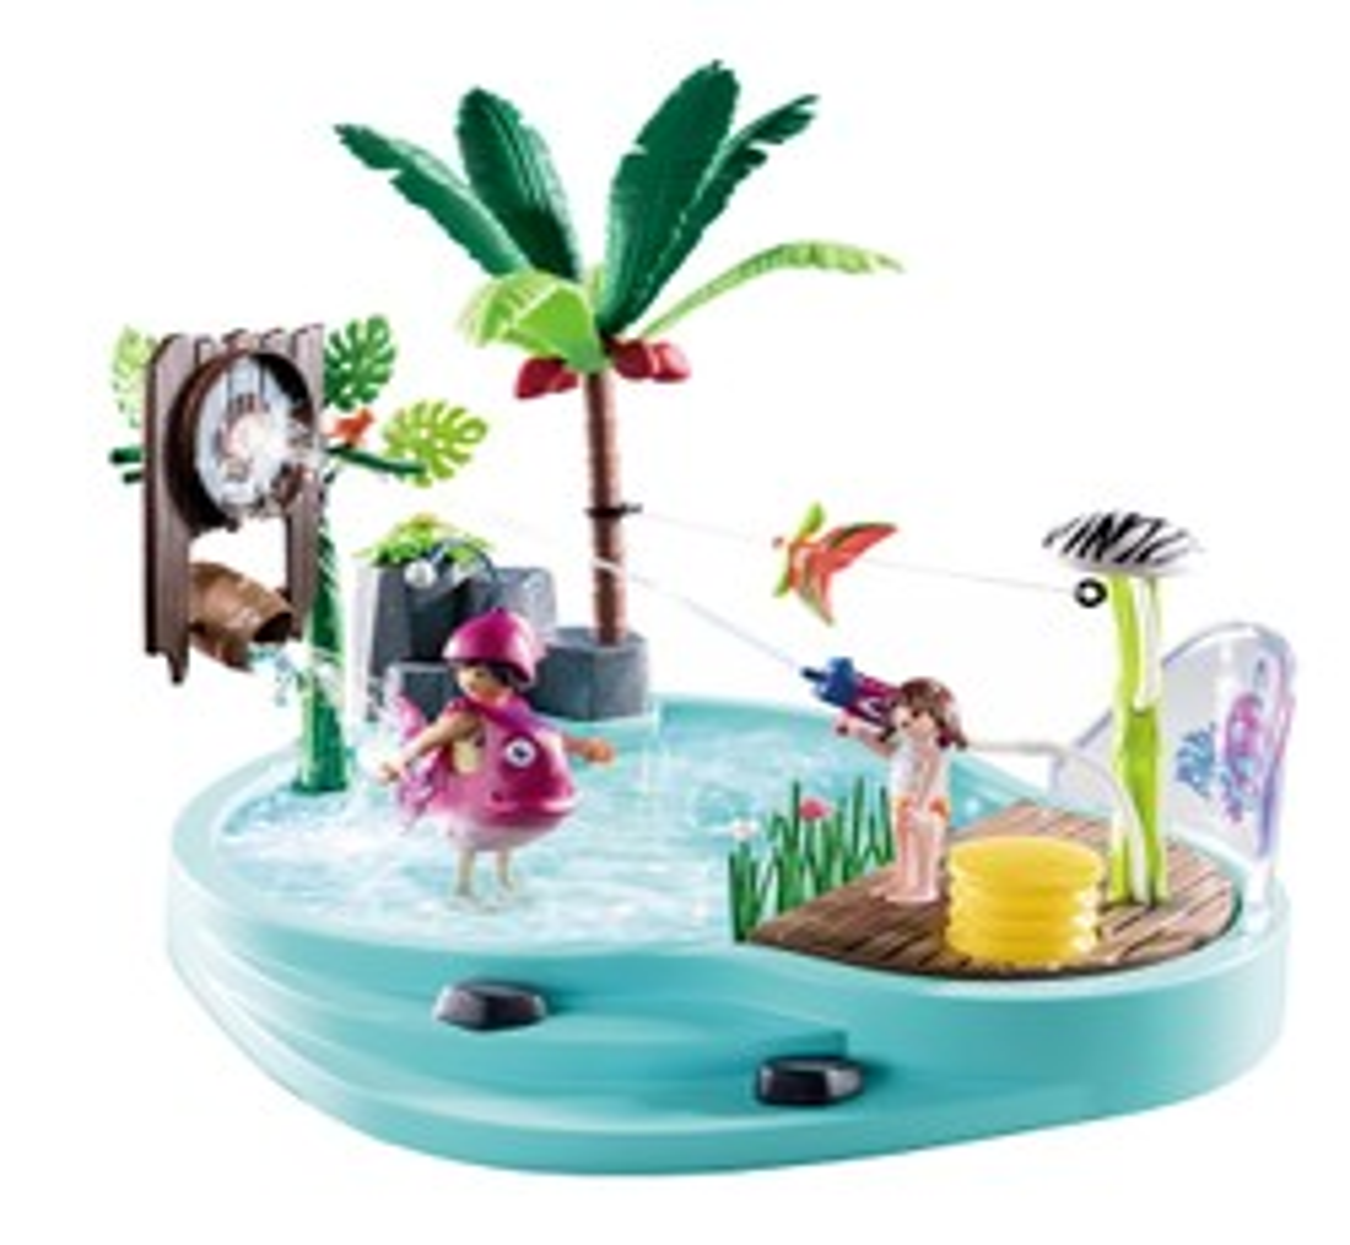 Piscine avec jet d'eau -PLAYMOBIL Family Fun - 70610